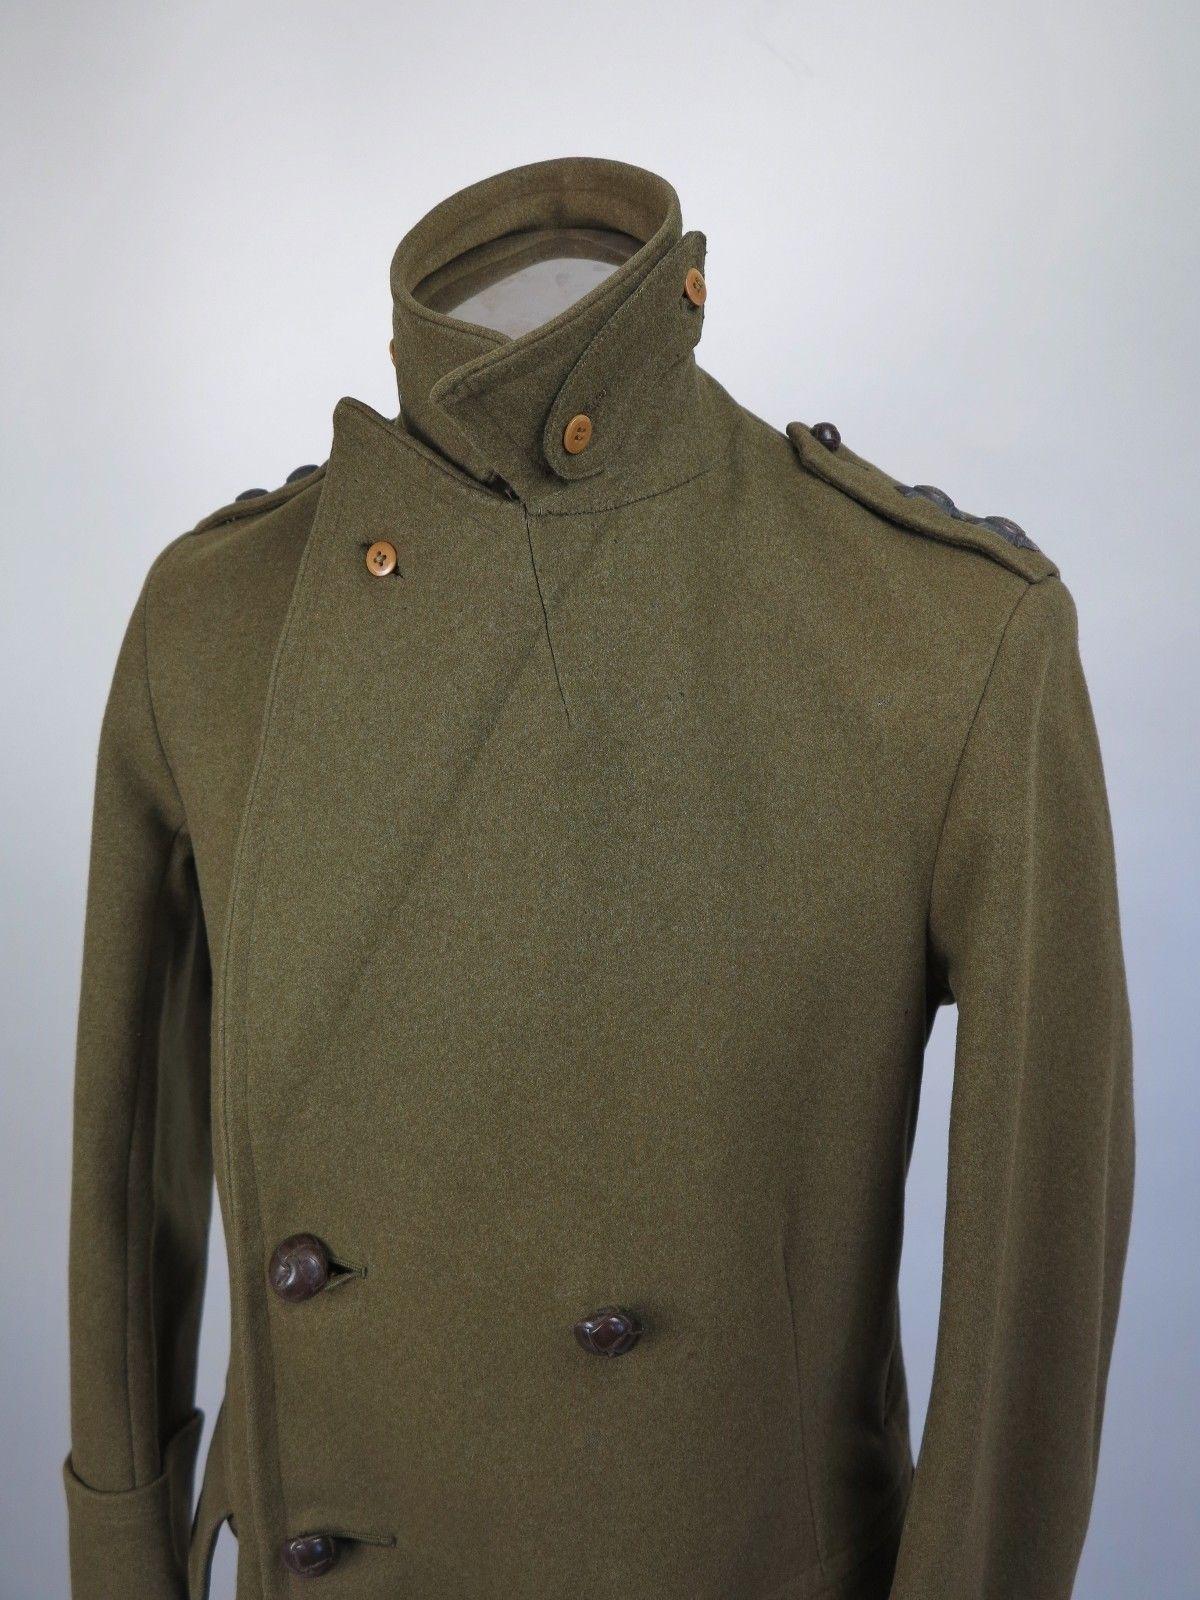 British Greatcoat WW1 Coat WW2 Greatcoat Officers Coat Bespoke Vtg ...